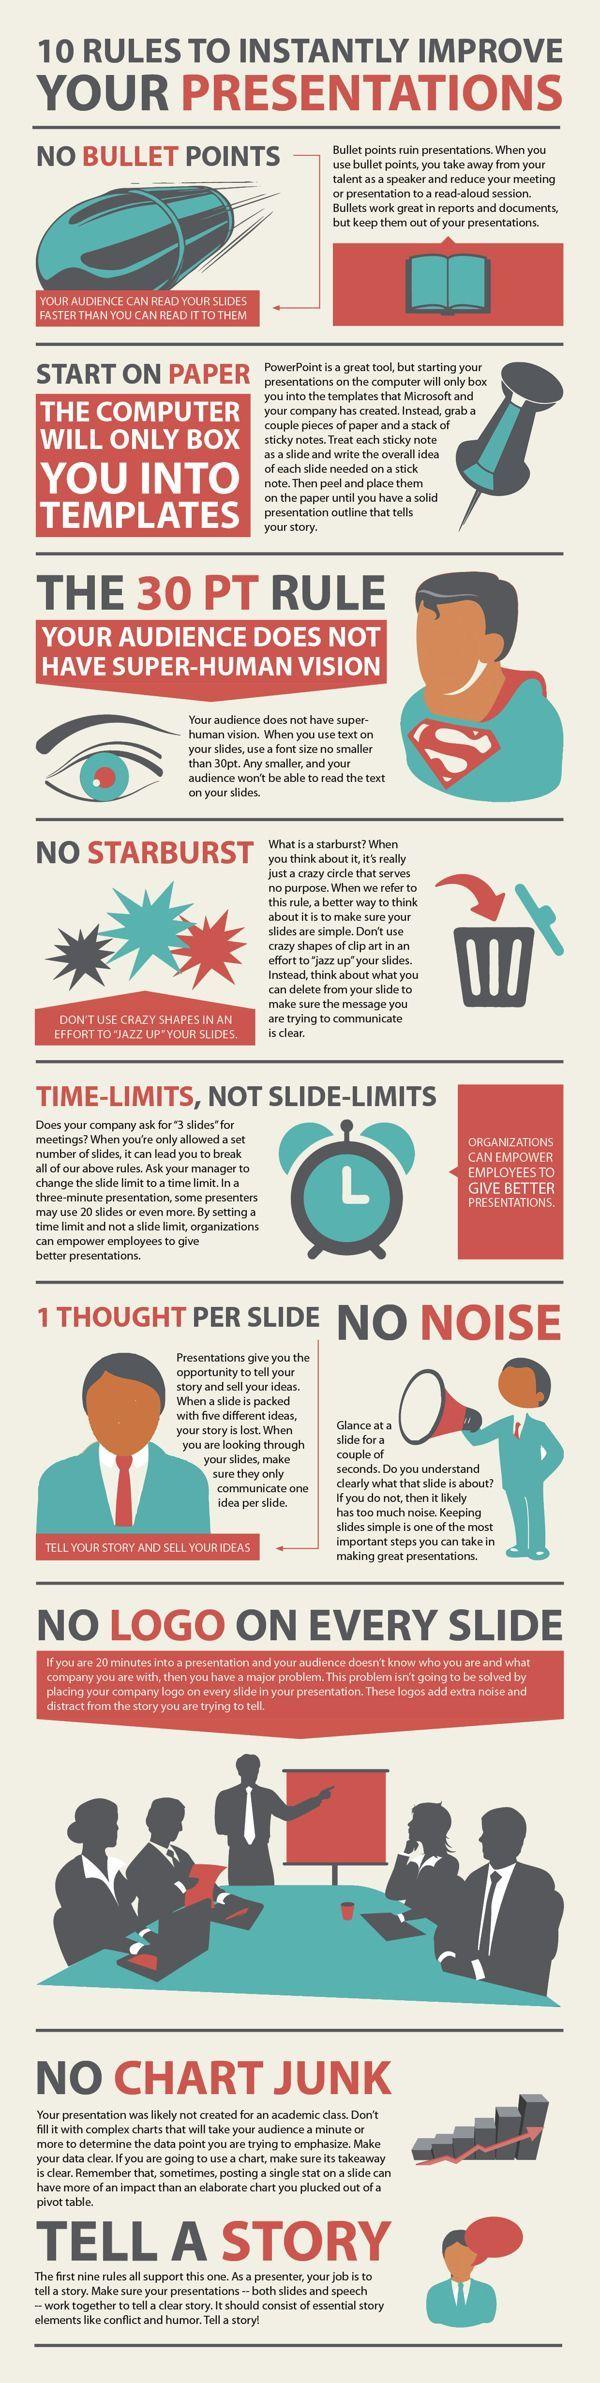 10 Presentation Rules You Had No Idea You Were Breaking